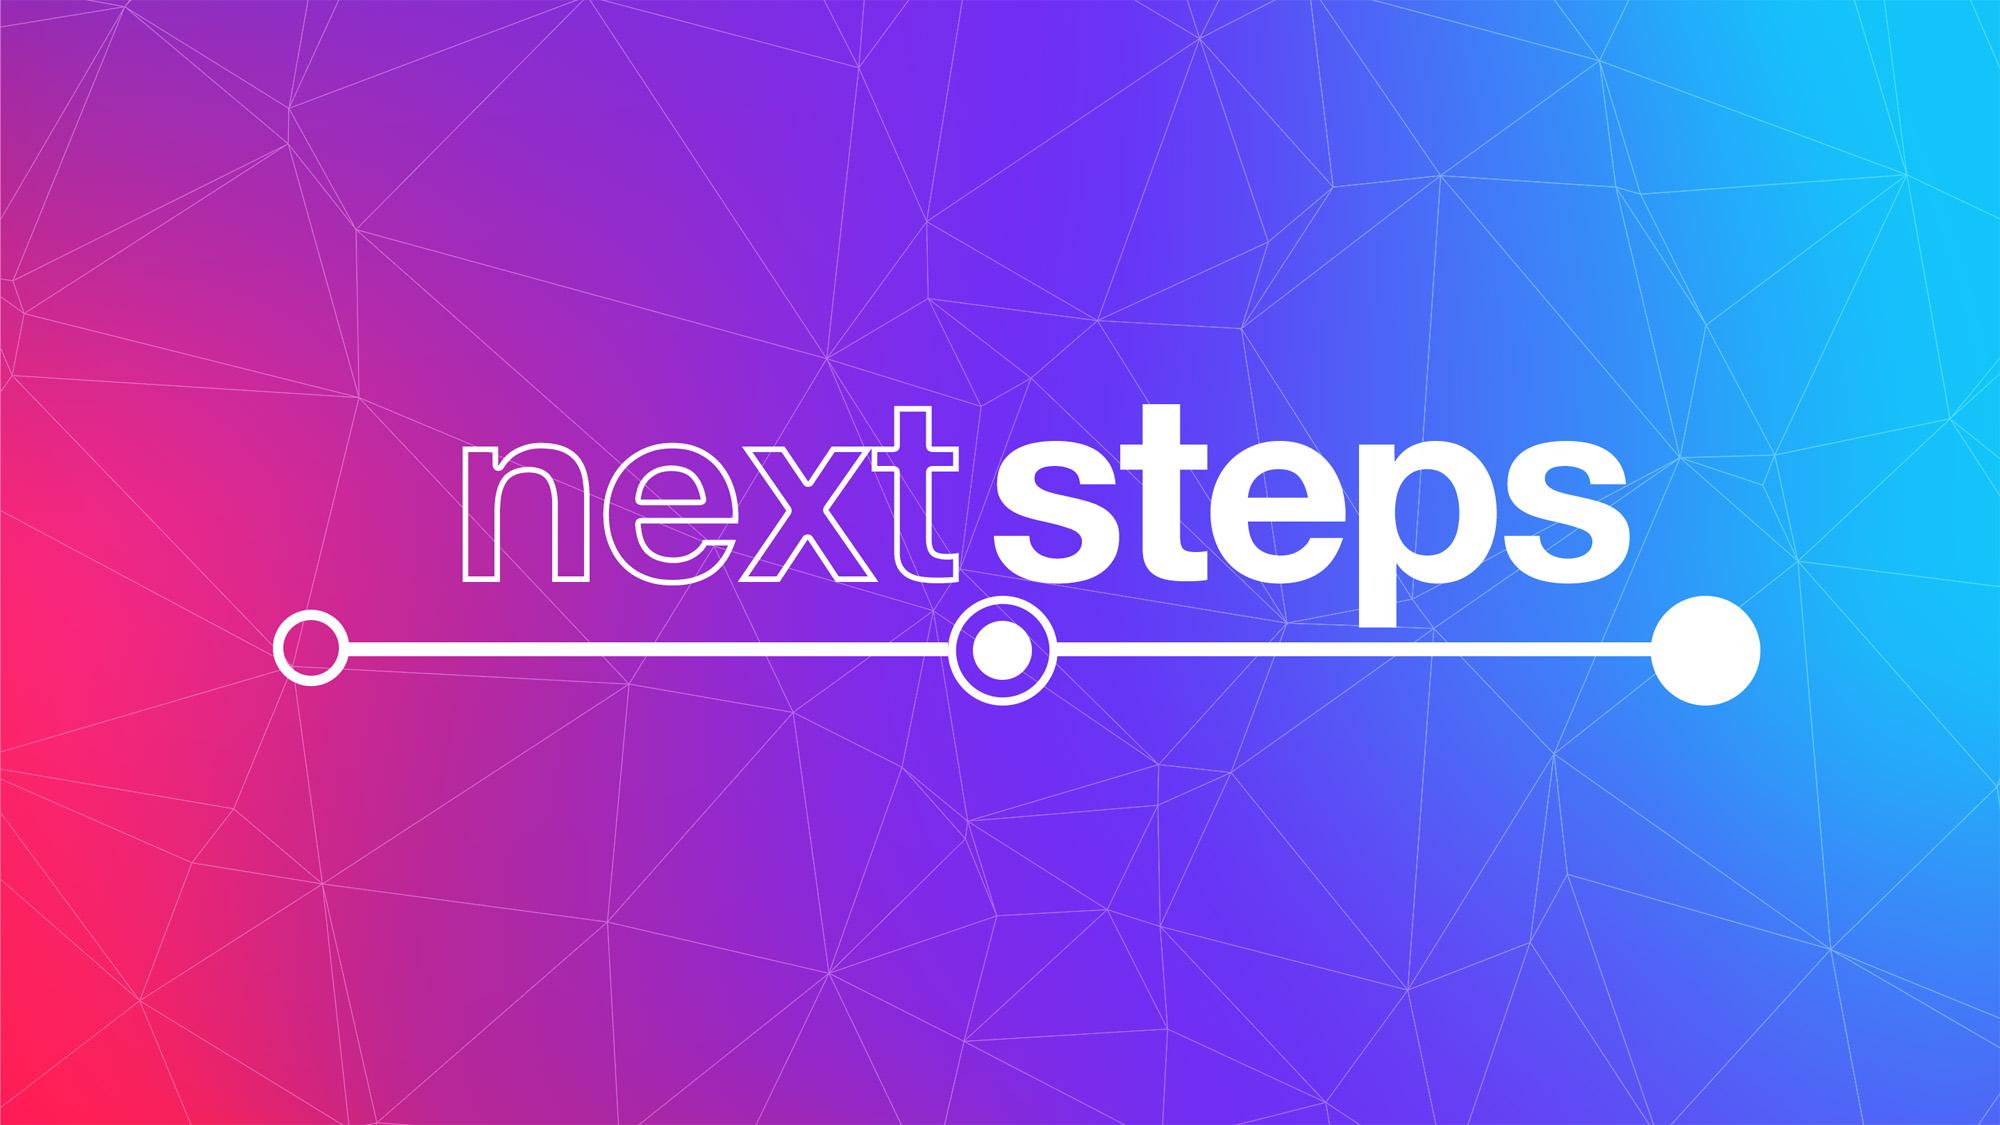 next_steps-title-1-Wide 16x9.jpg